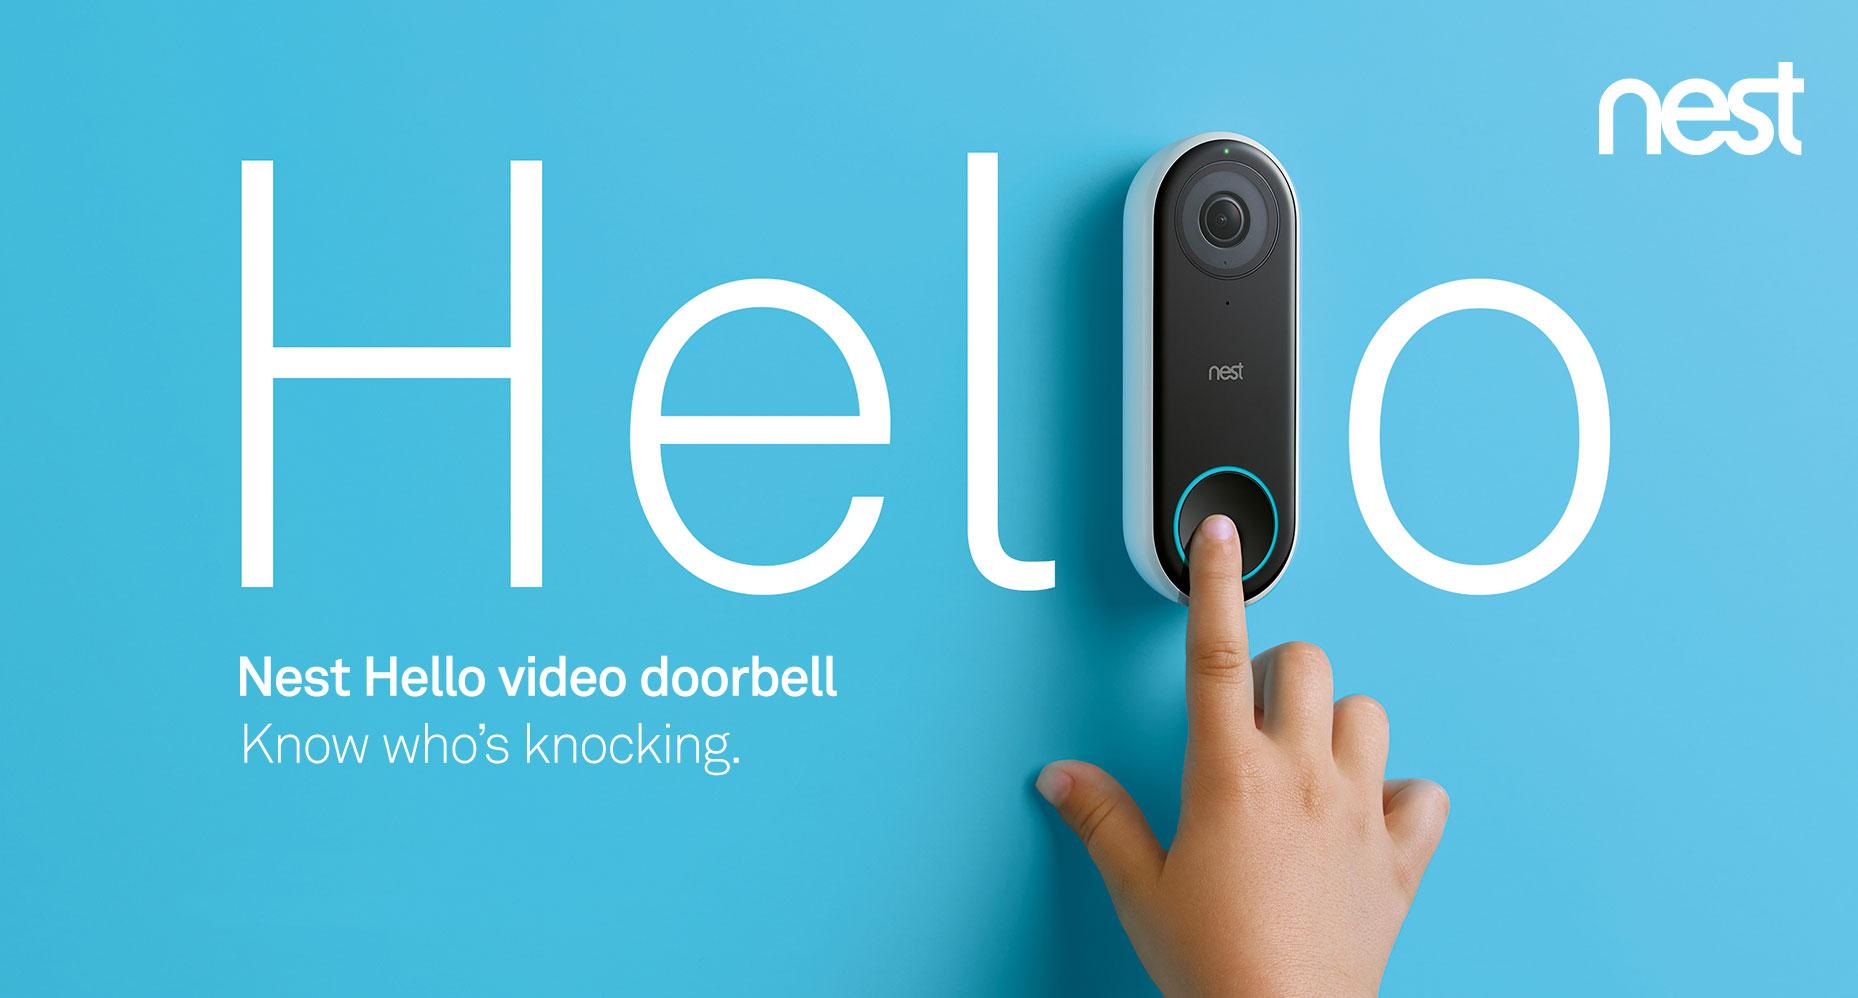 Nest Hello video doorbell pro installer